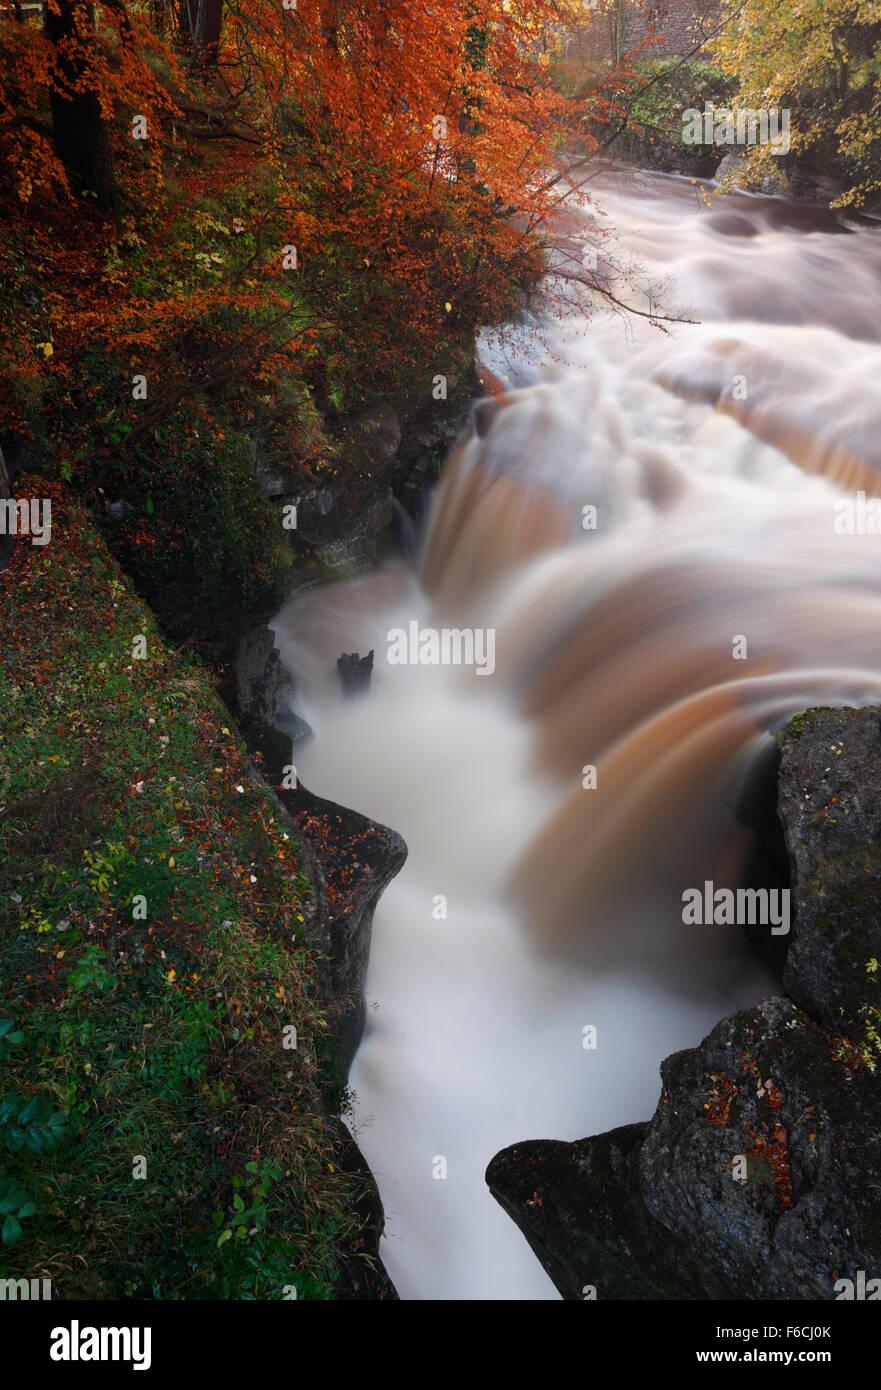 The River Eden in full flow during heavy rain, Autumn. Eden Valley. Cumbria. UK. - Stock Image